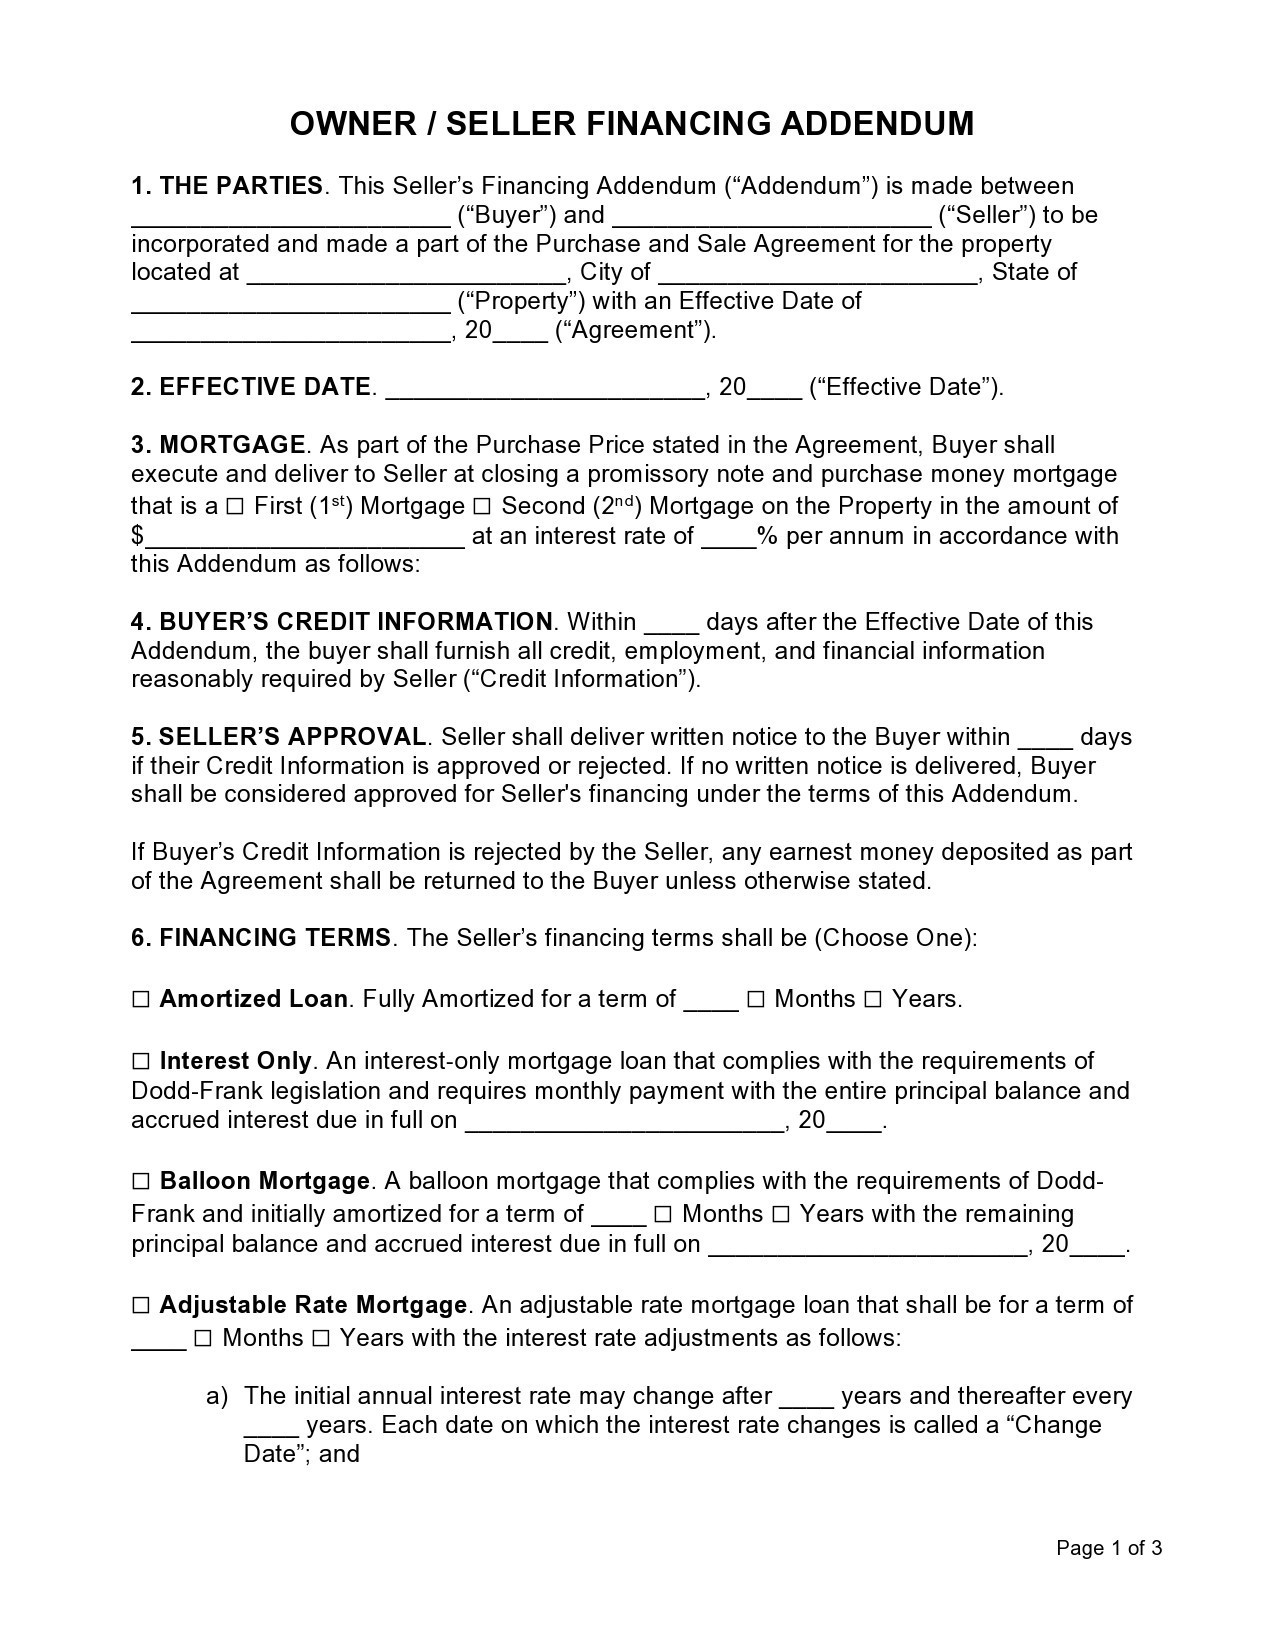 Free seller financing addendum 06